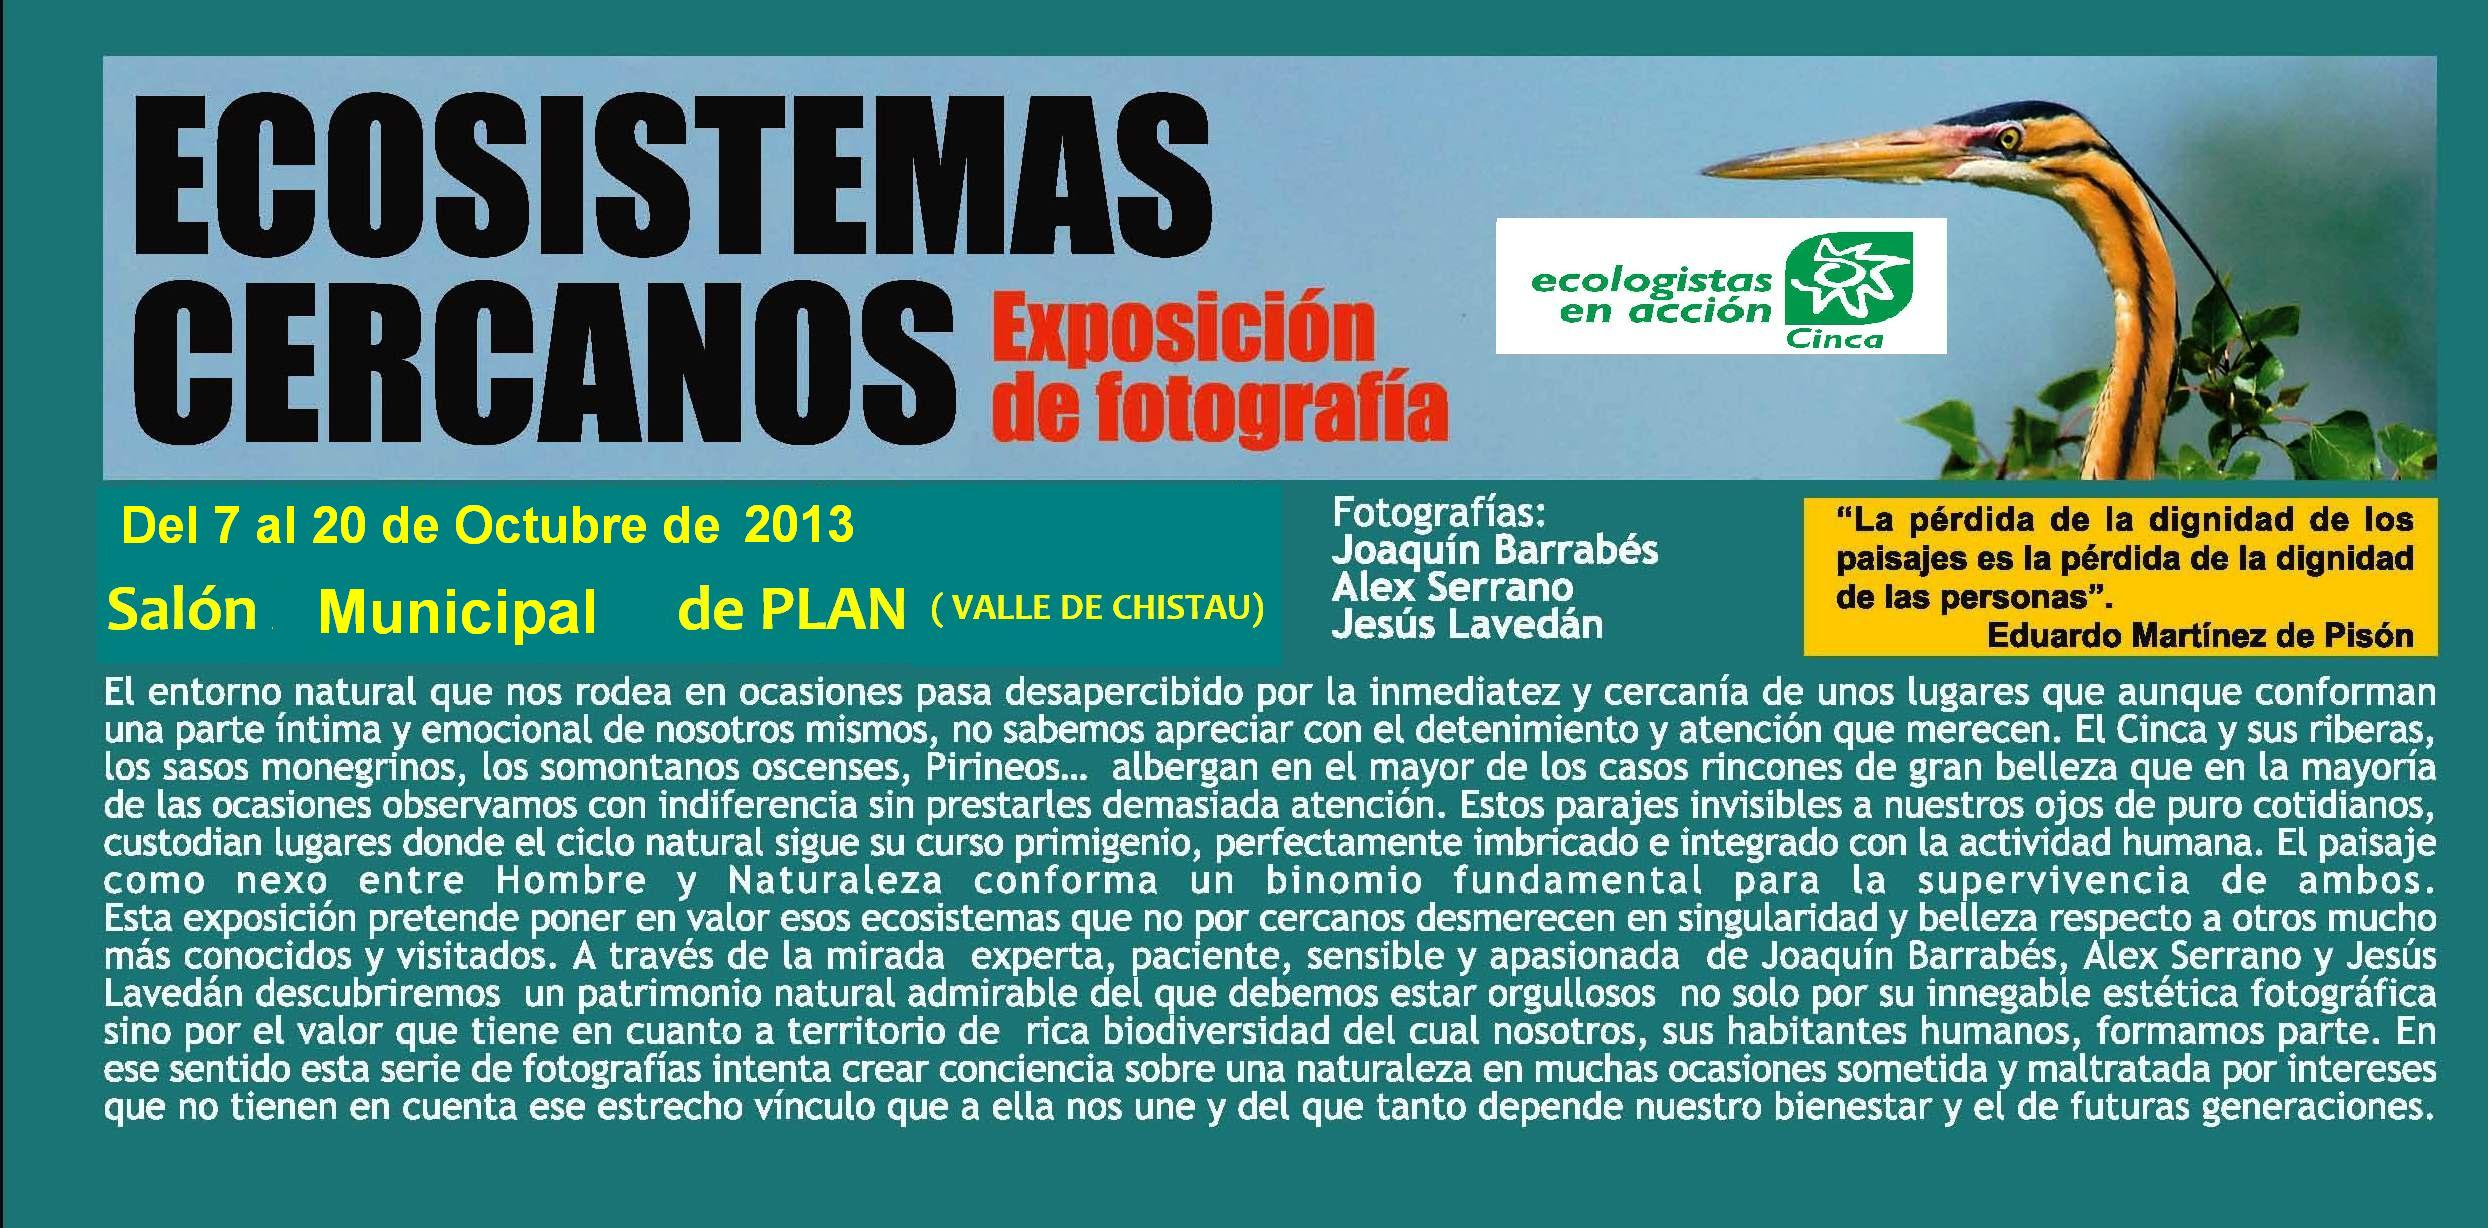 EXPOECOLOS_FOTOS_ECOSISTEMAS_CERCANOS